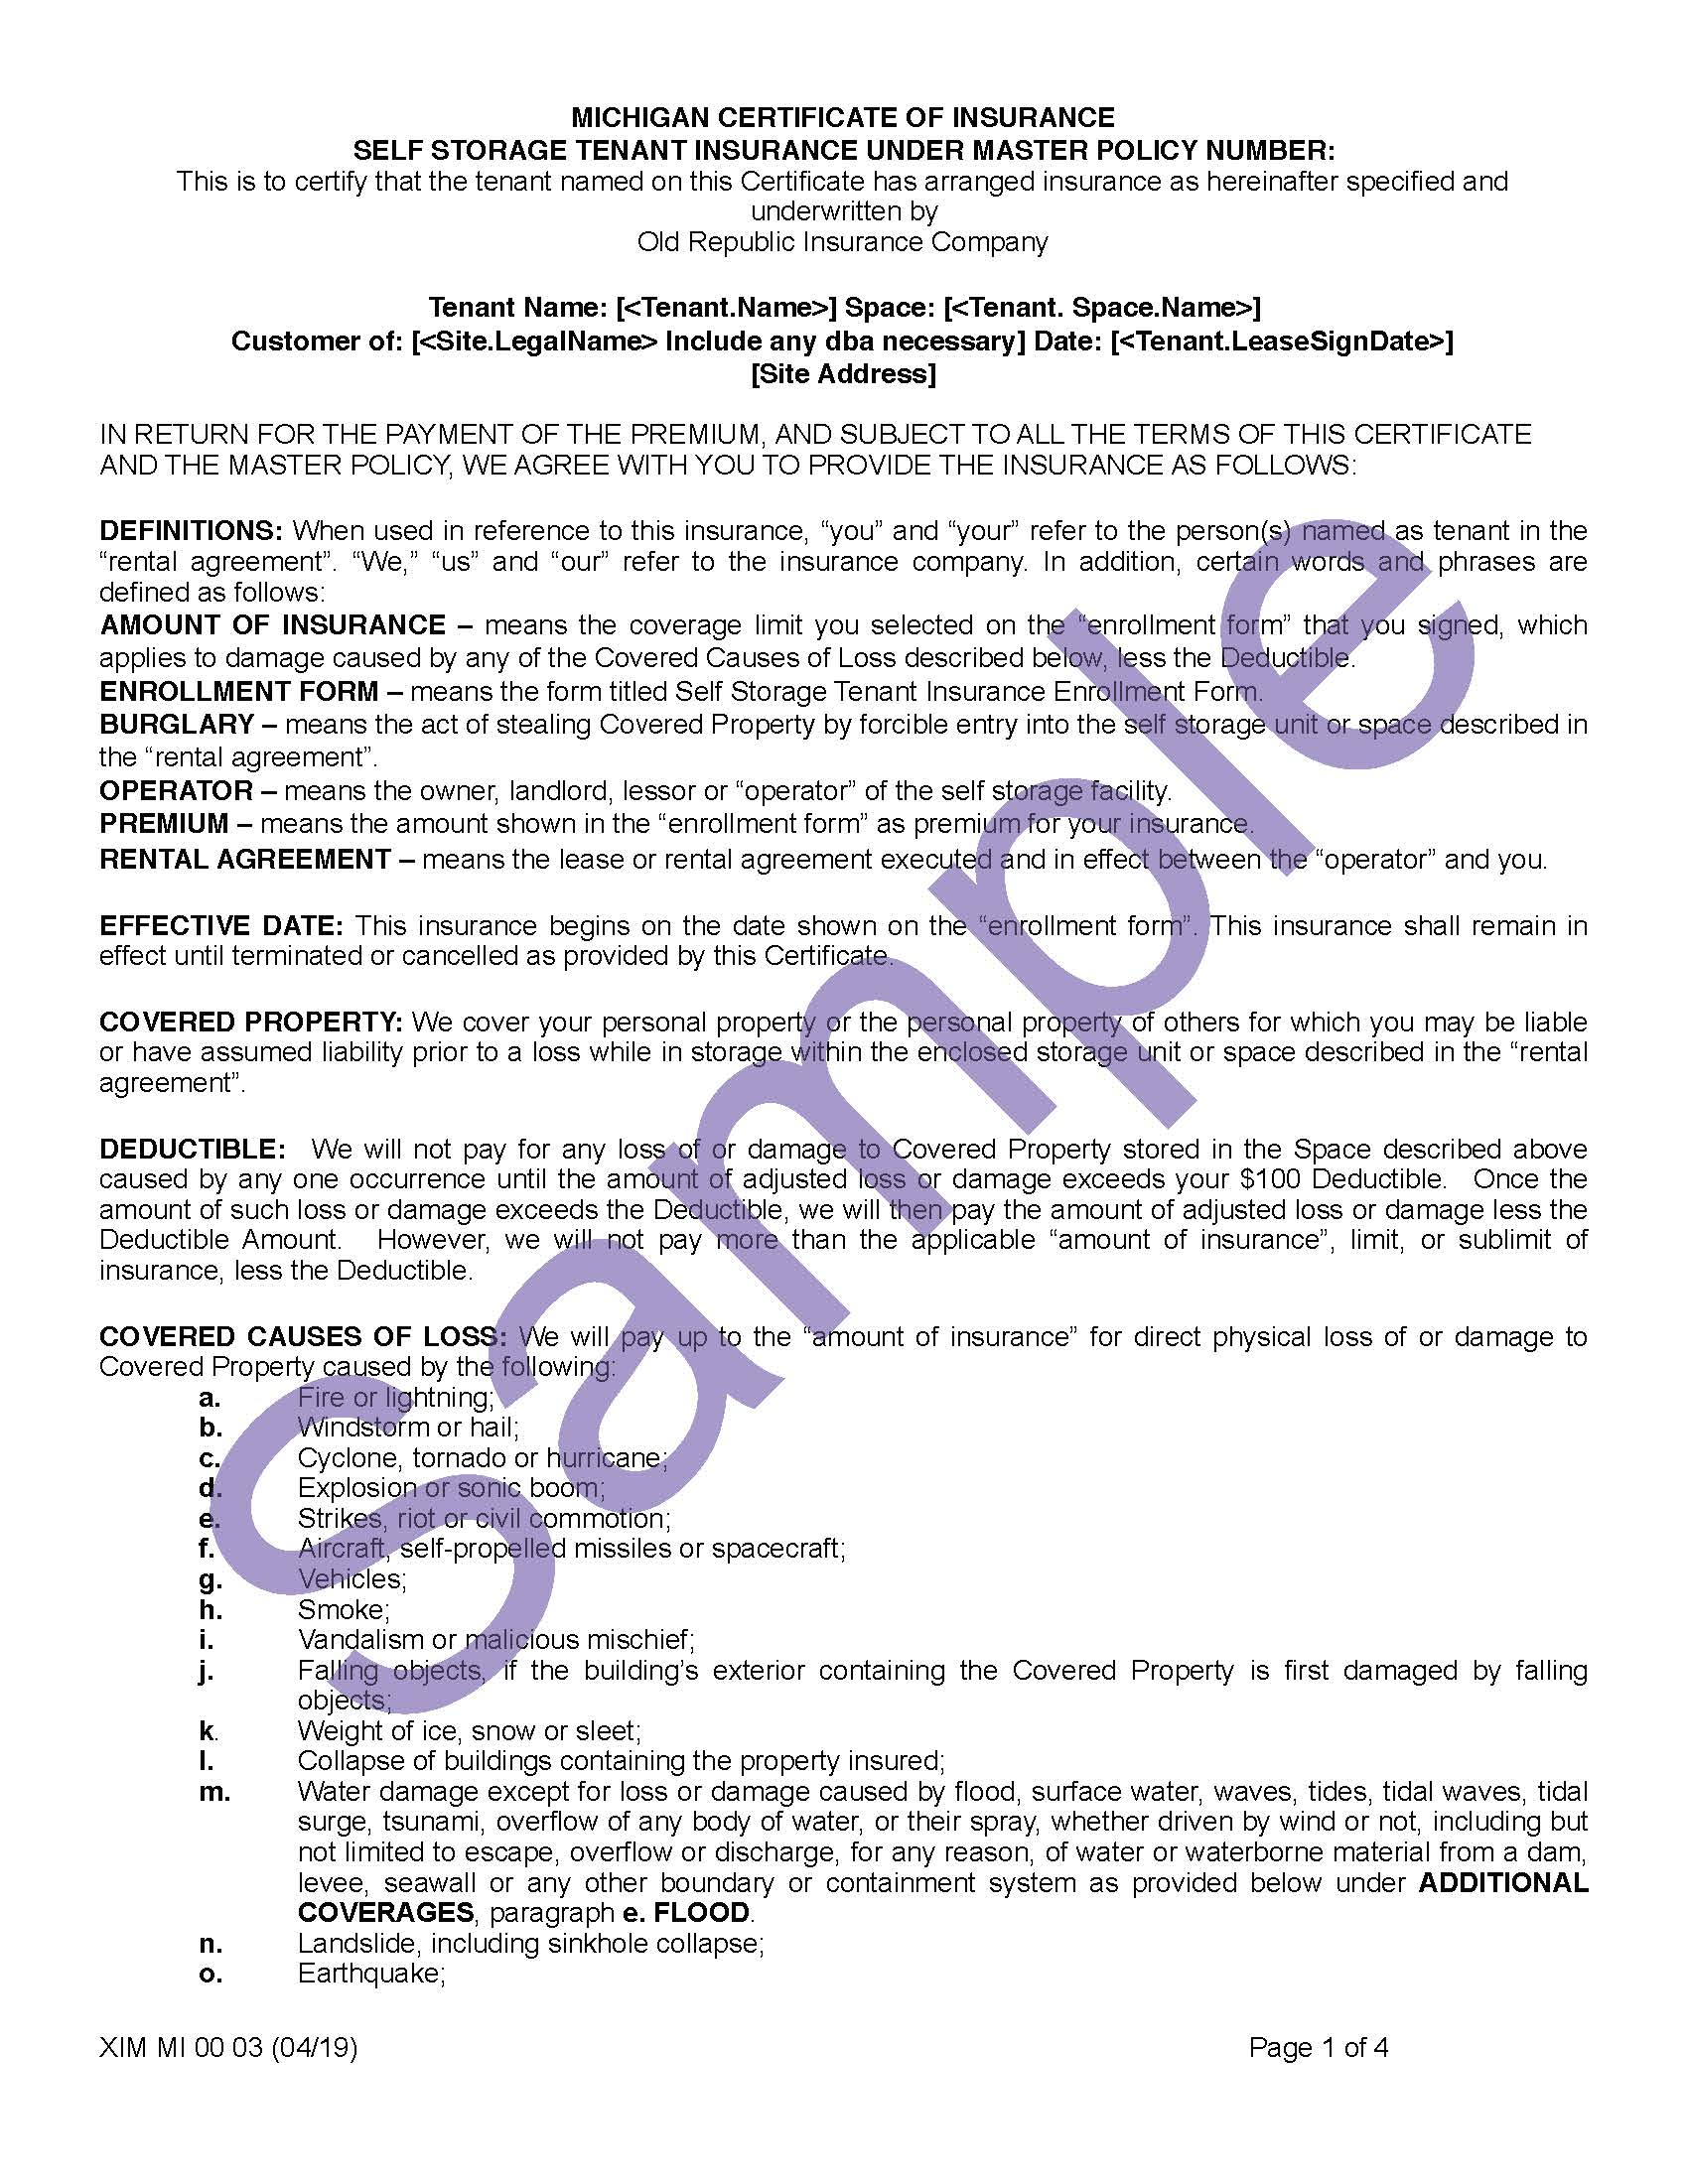 XIM MI 00 03 04 19 Michigan Certificate of InsuranceSample_Page_1.jpg